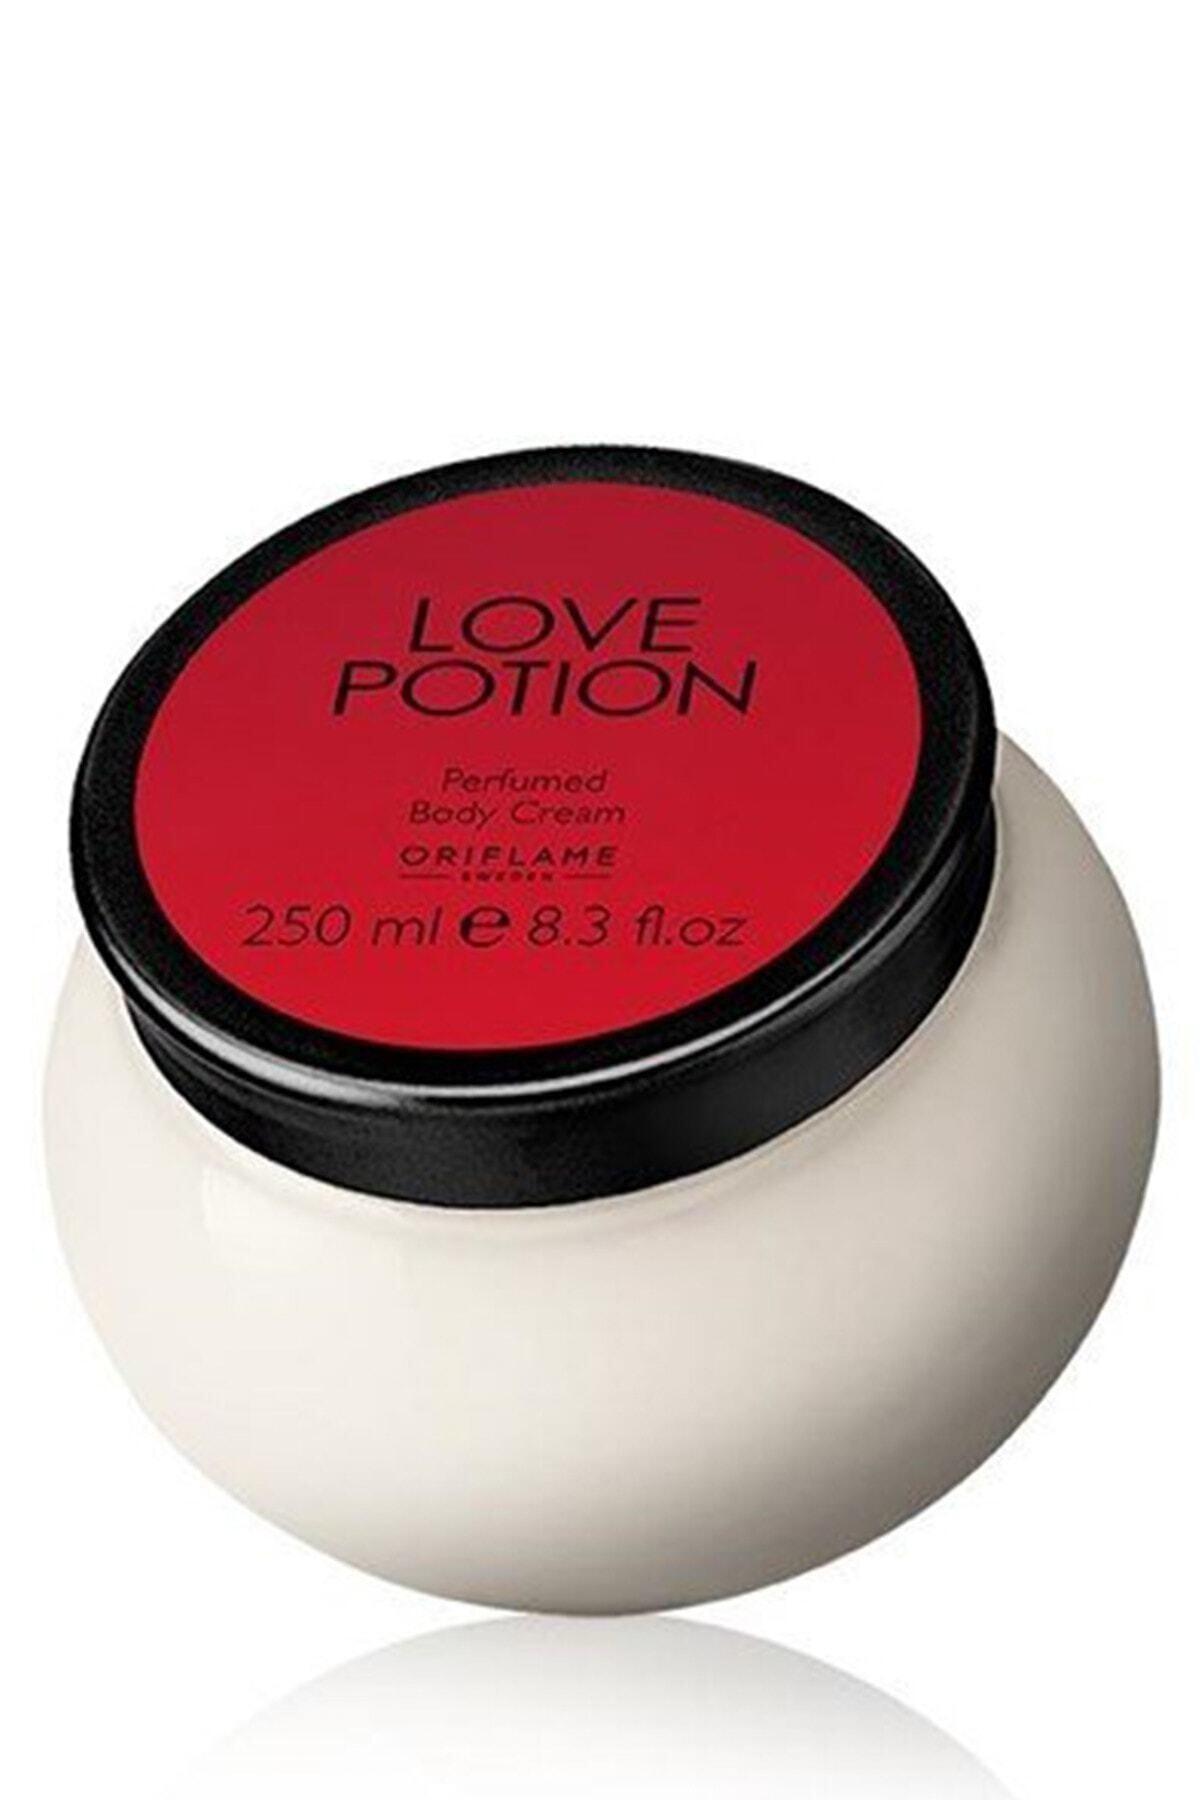 Oriflame Love Potion Parfümlü Vücut Kremi 250 ml 7895678697586 1